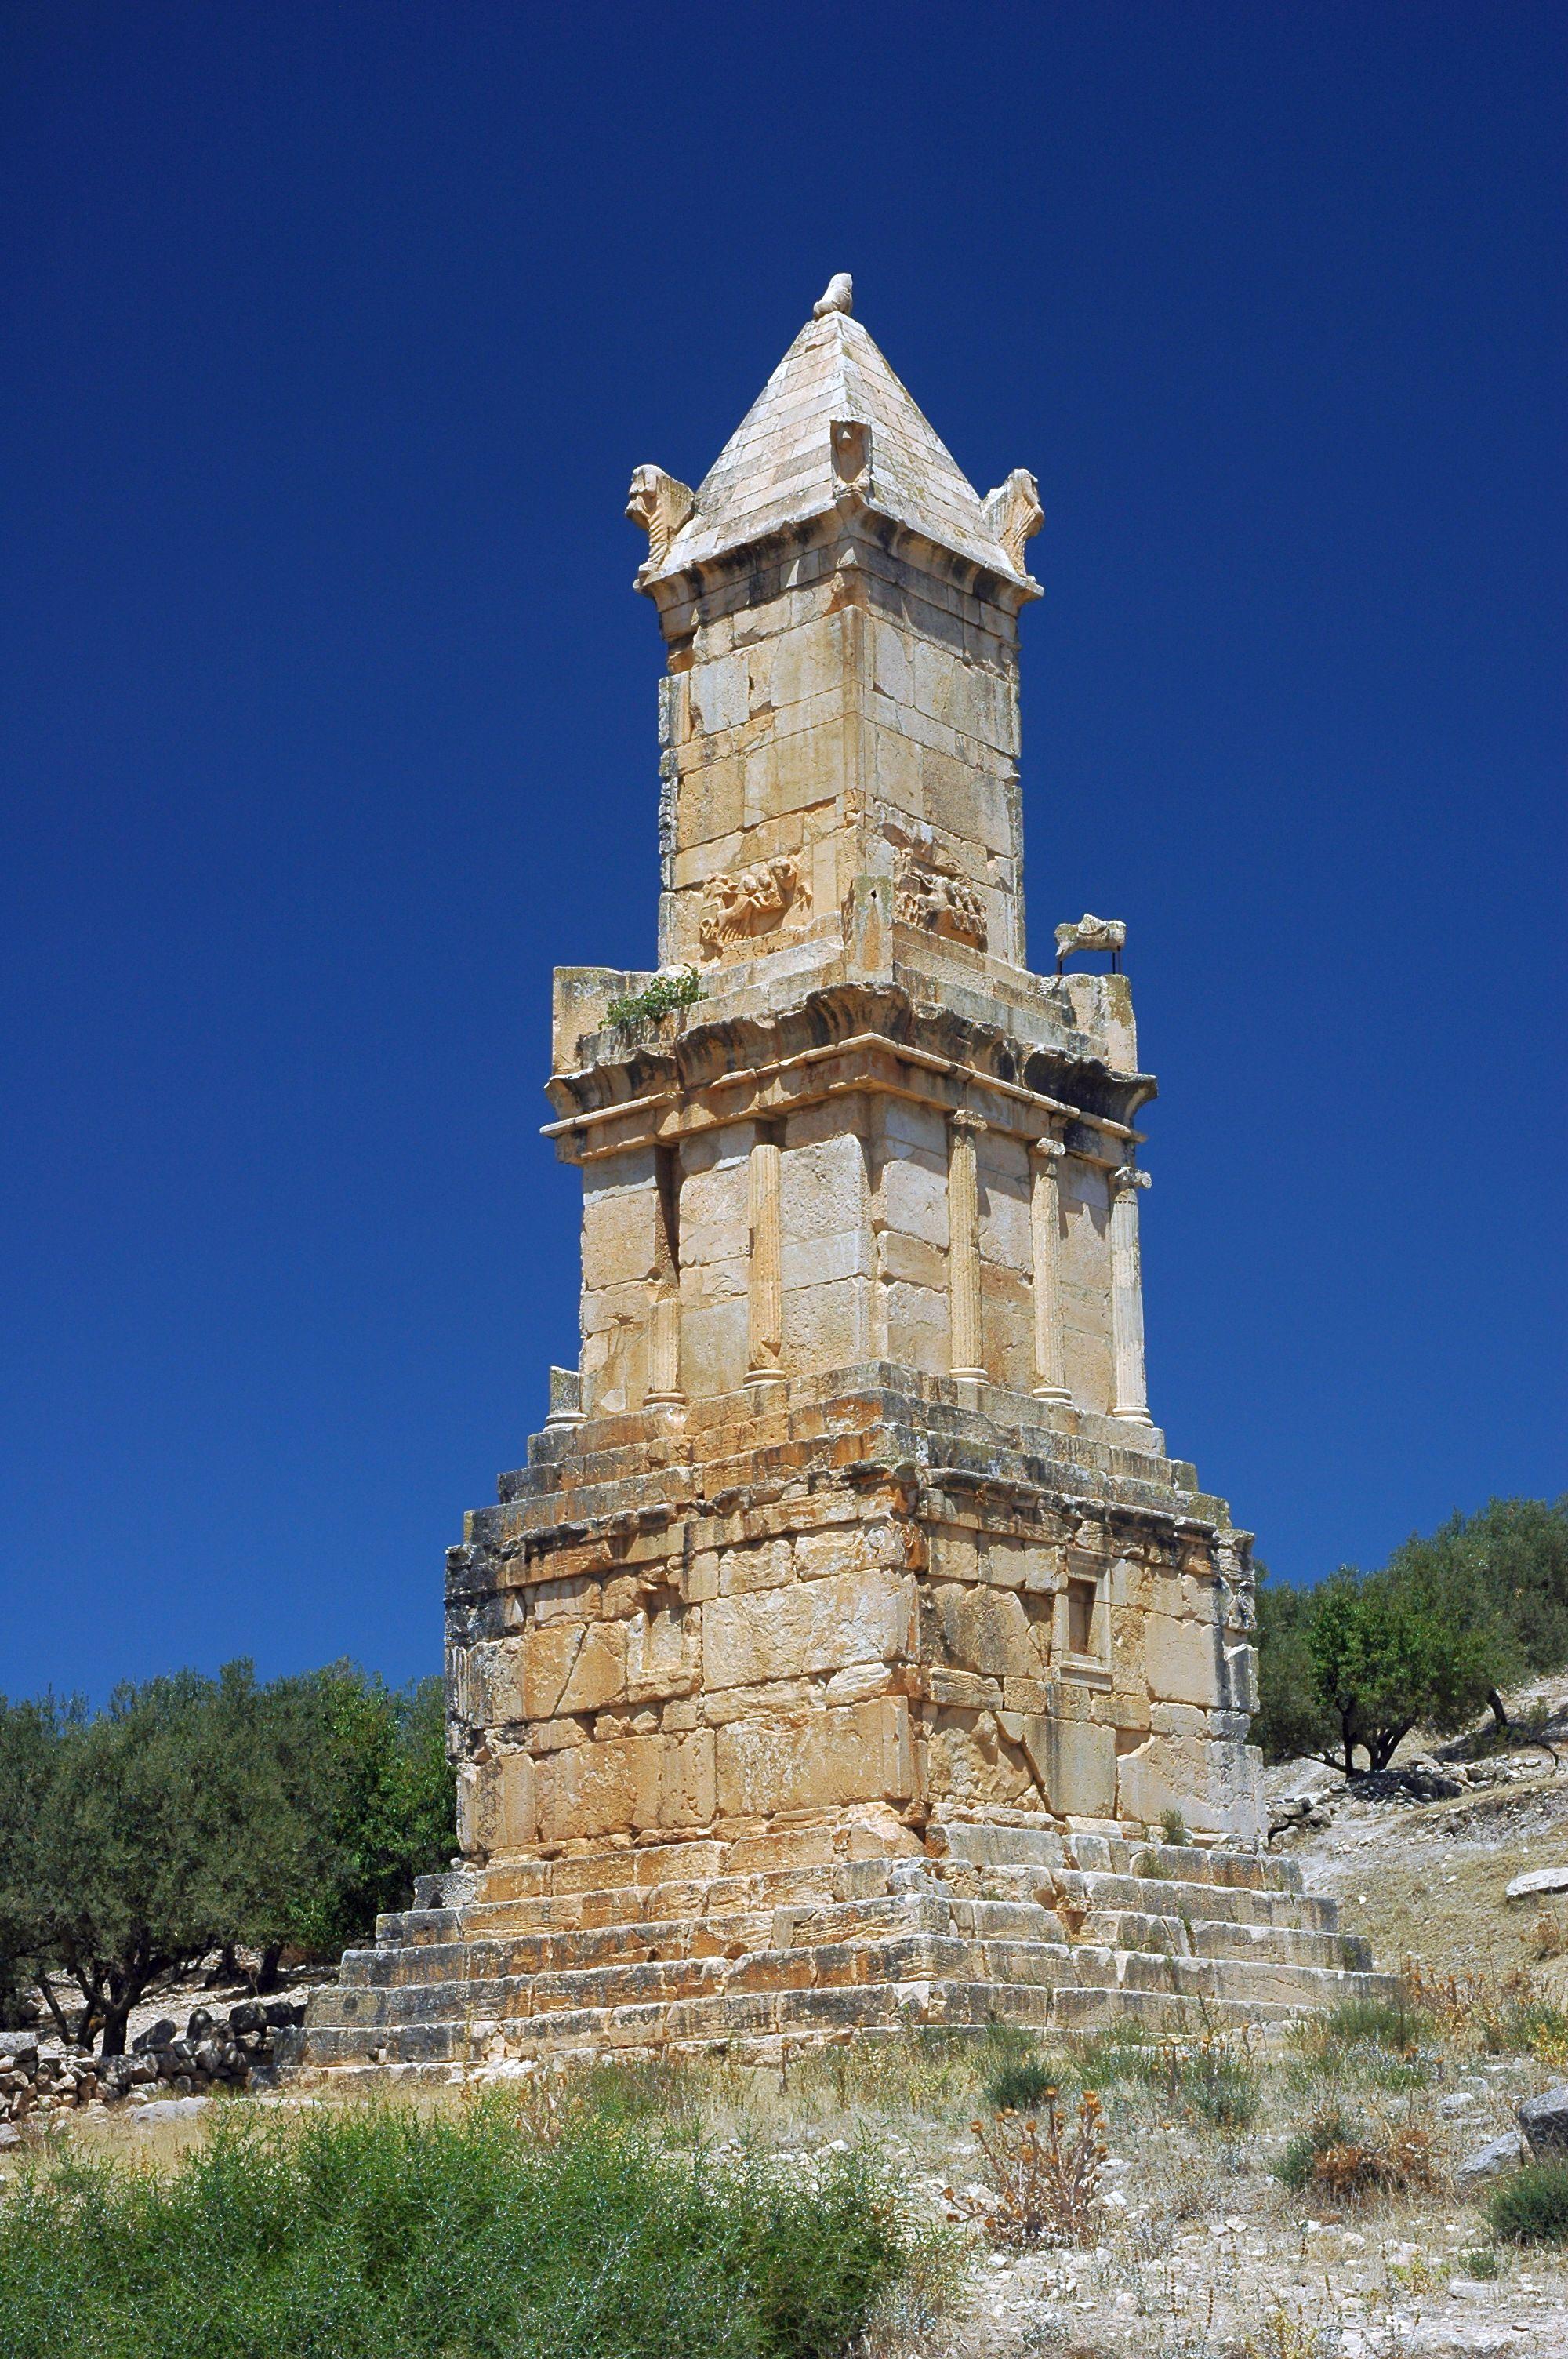 The tomb of Masinissa